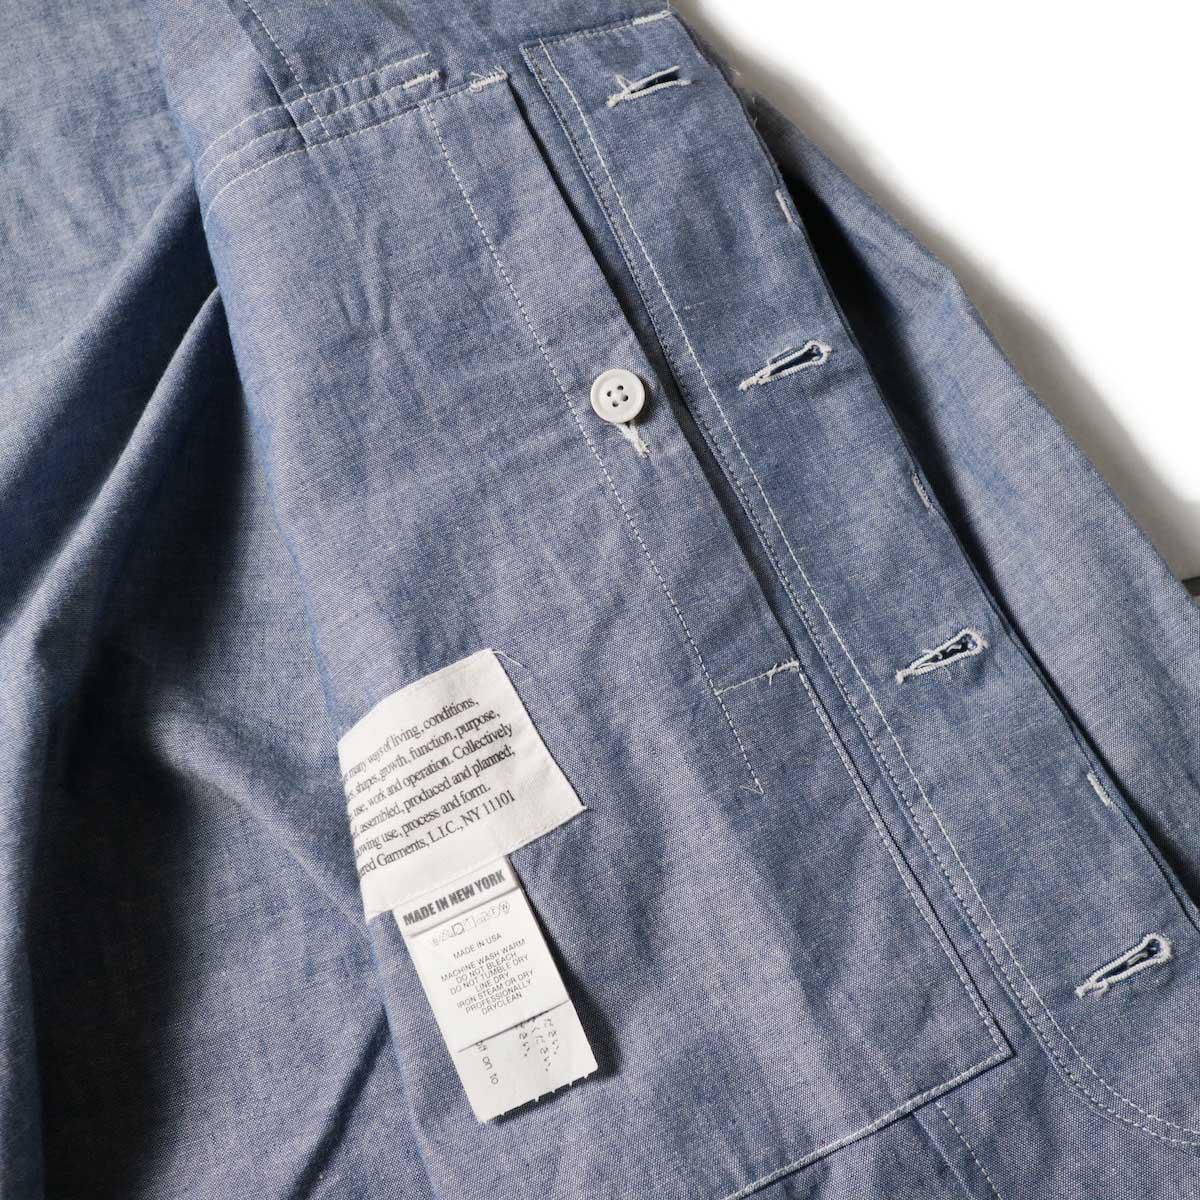 Engineered Garments / MC Shirt Jacket -Cotton Chambray (Blue)内ポケット